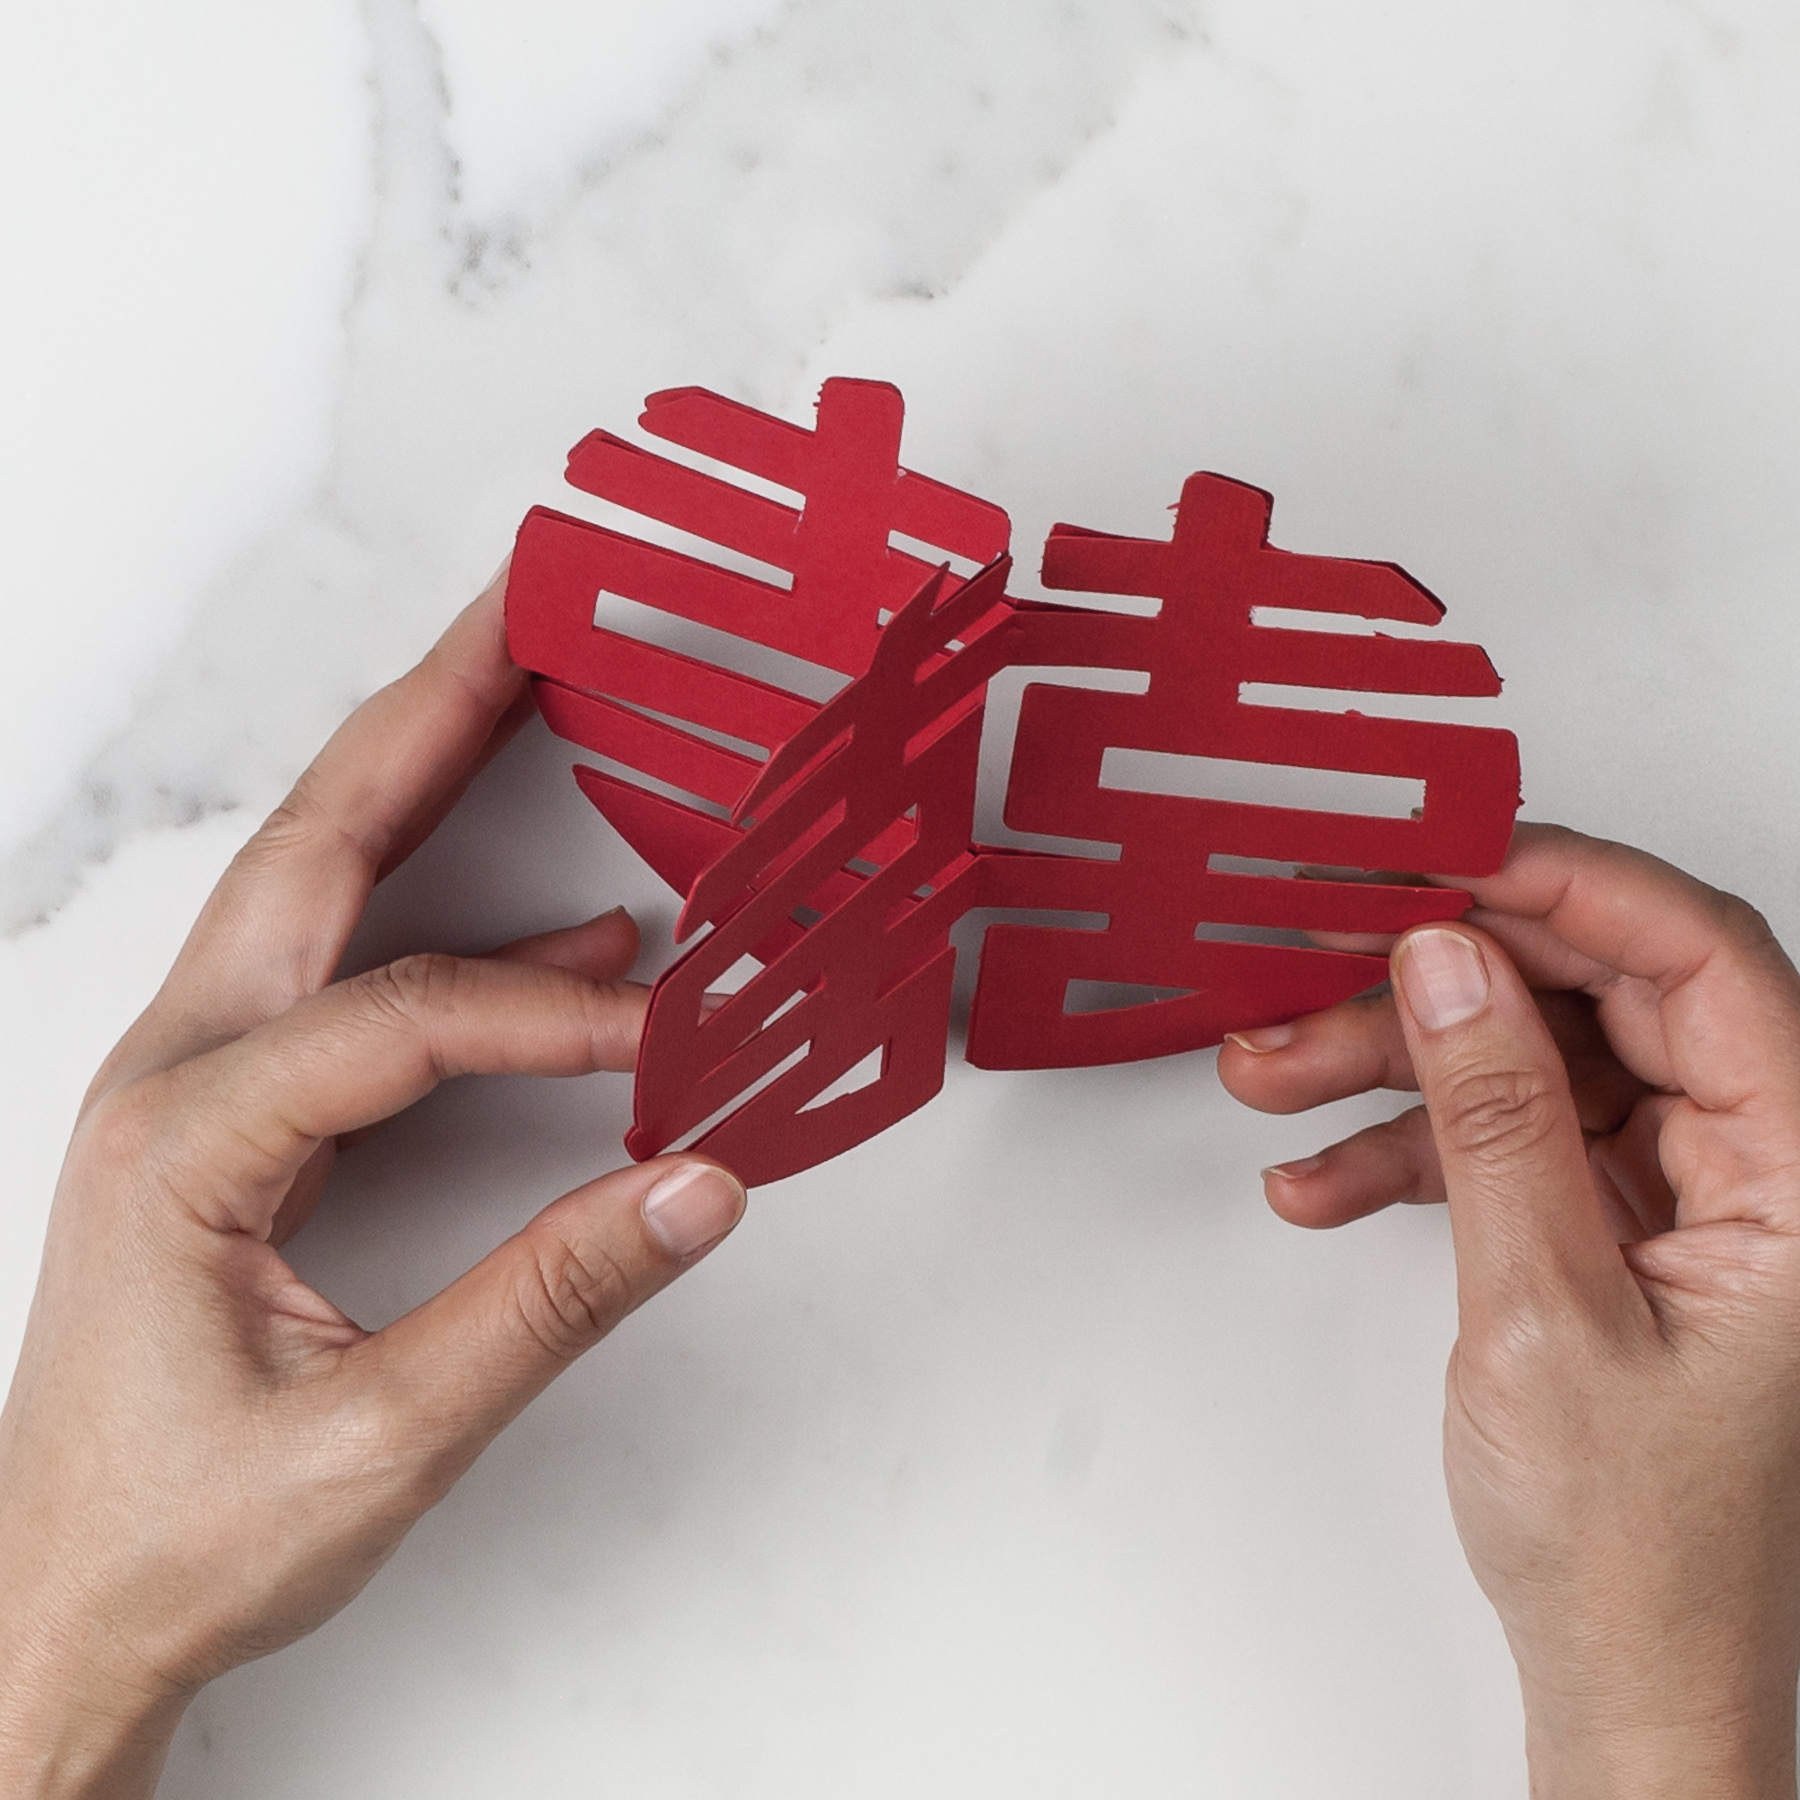 Connect two faces into a 3d shape